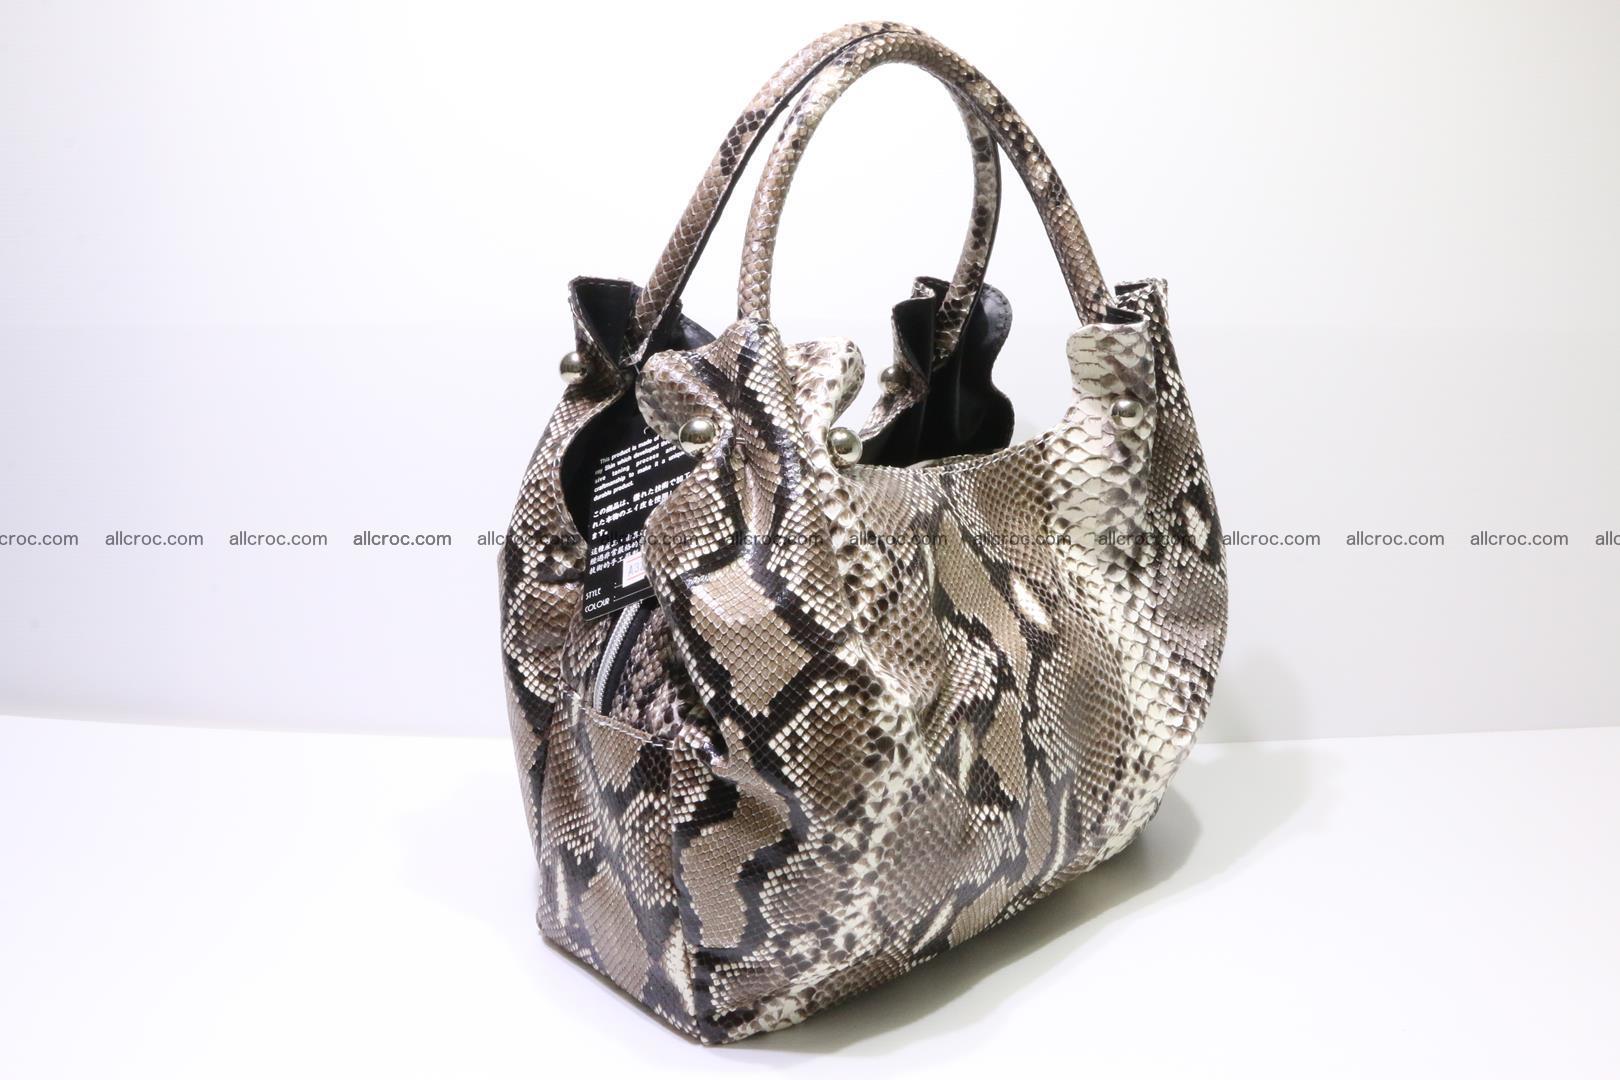 Python skin handbag for lady from genuine Python skin 202 Foto 1